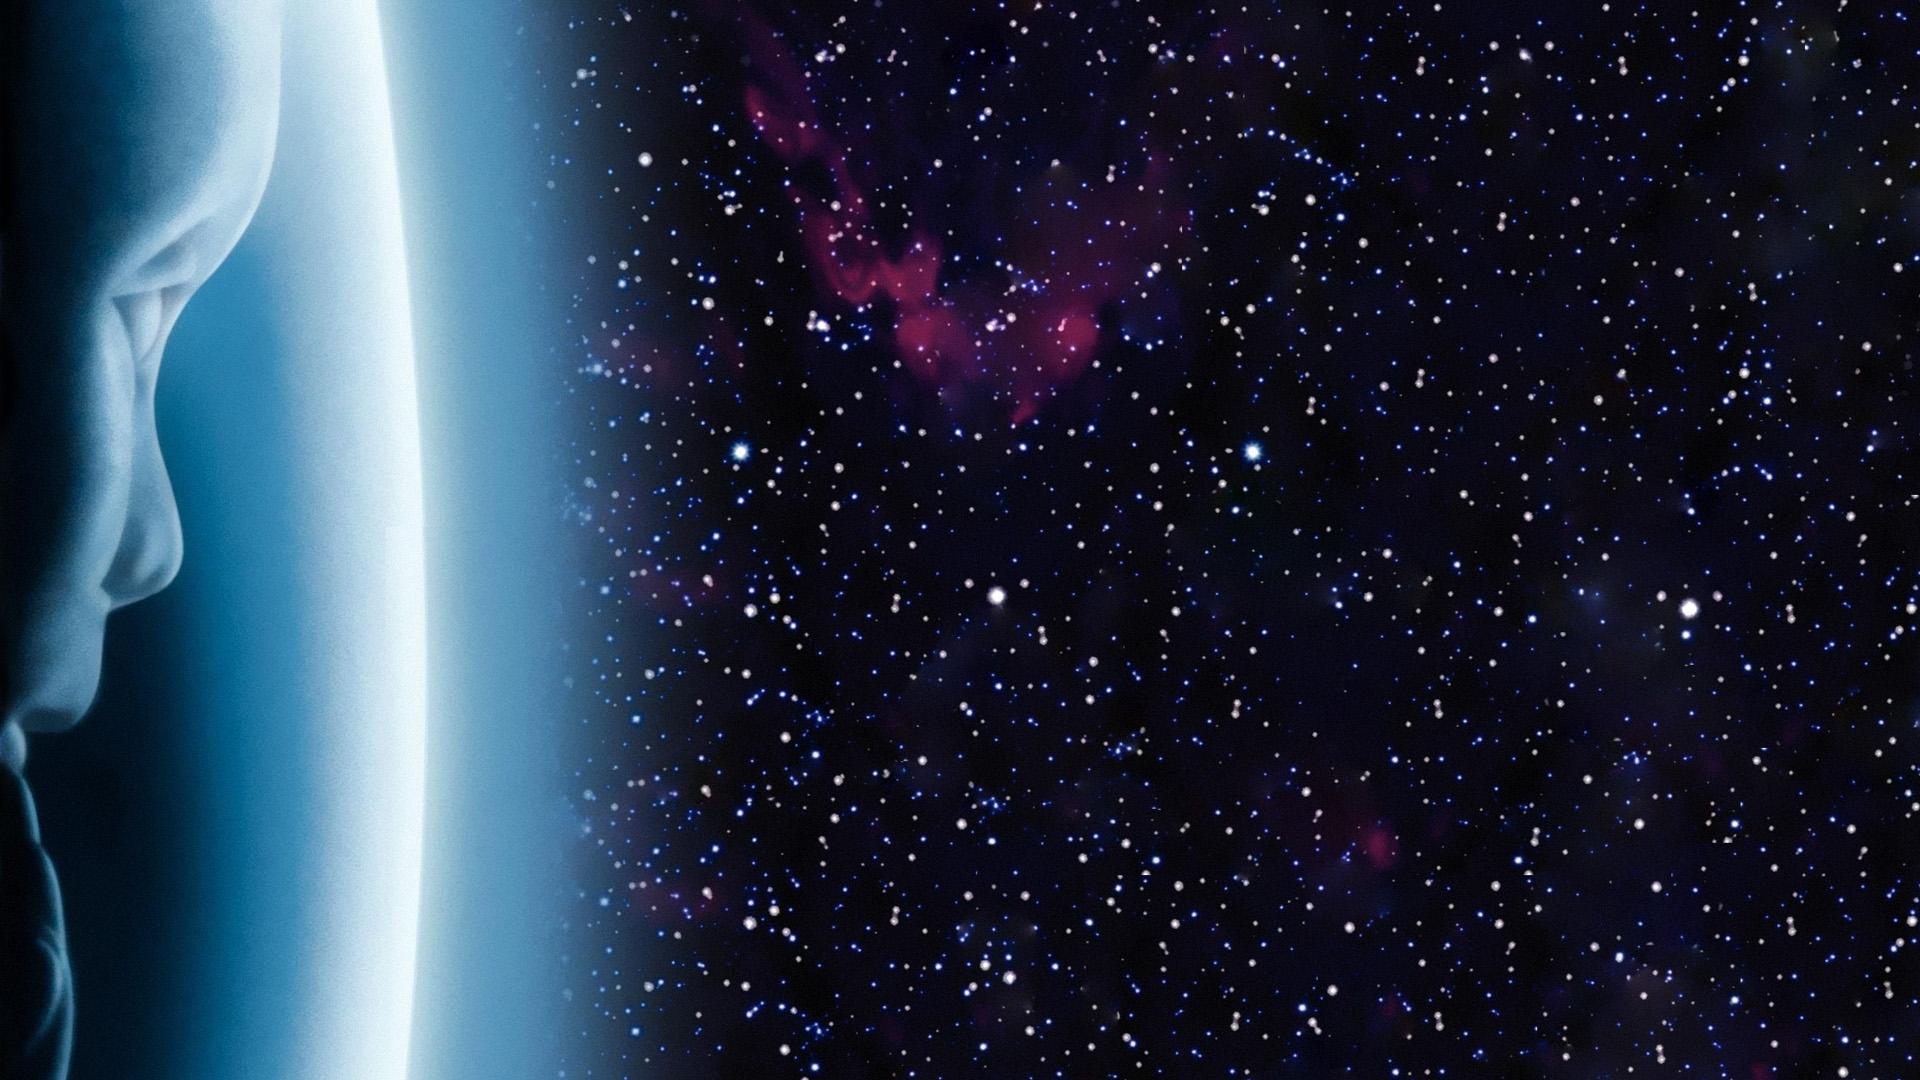 2001 A Space Odyssey Movie Fanart Fanart Tv border=